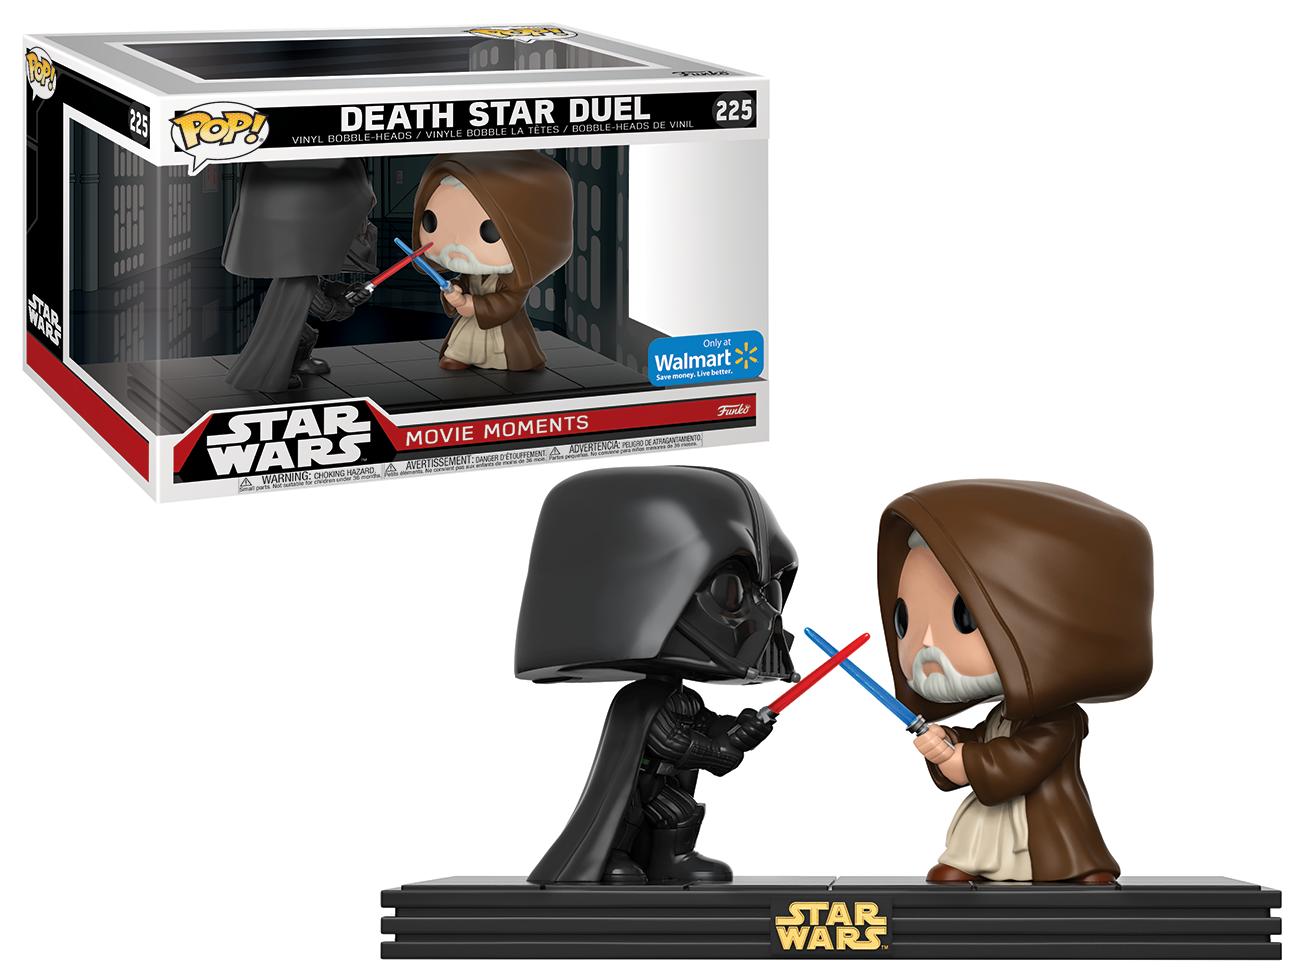 Funko POP! Star Wars: Movie Moments - Darth Vader vs. Obi Wan Kenobi Death Star